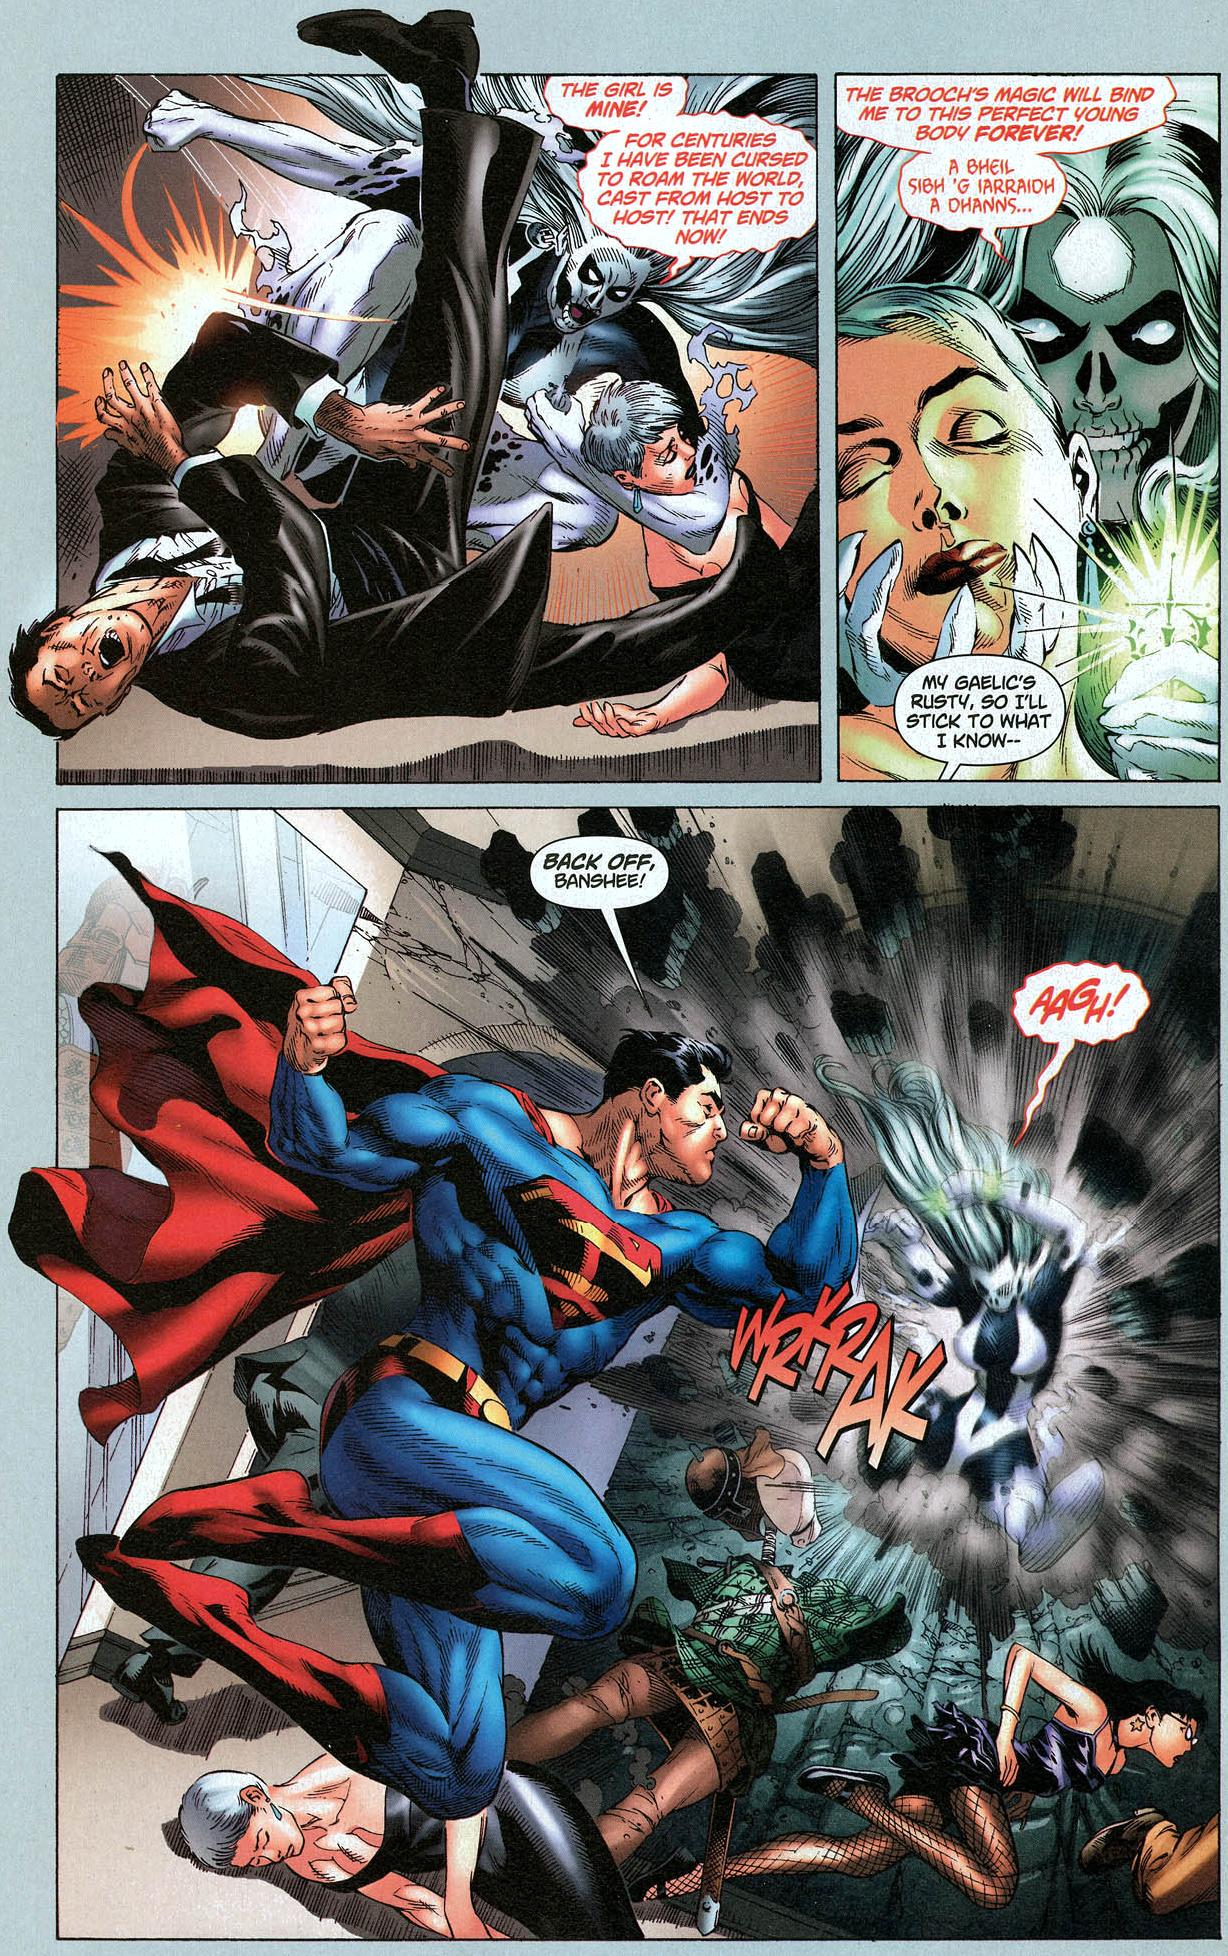 superman and batman vs silver banshee